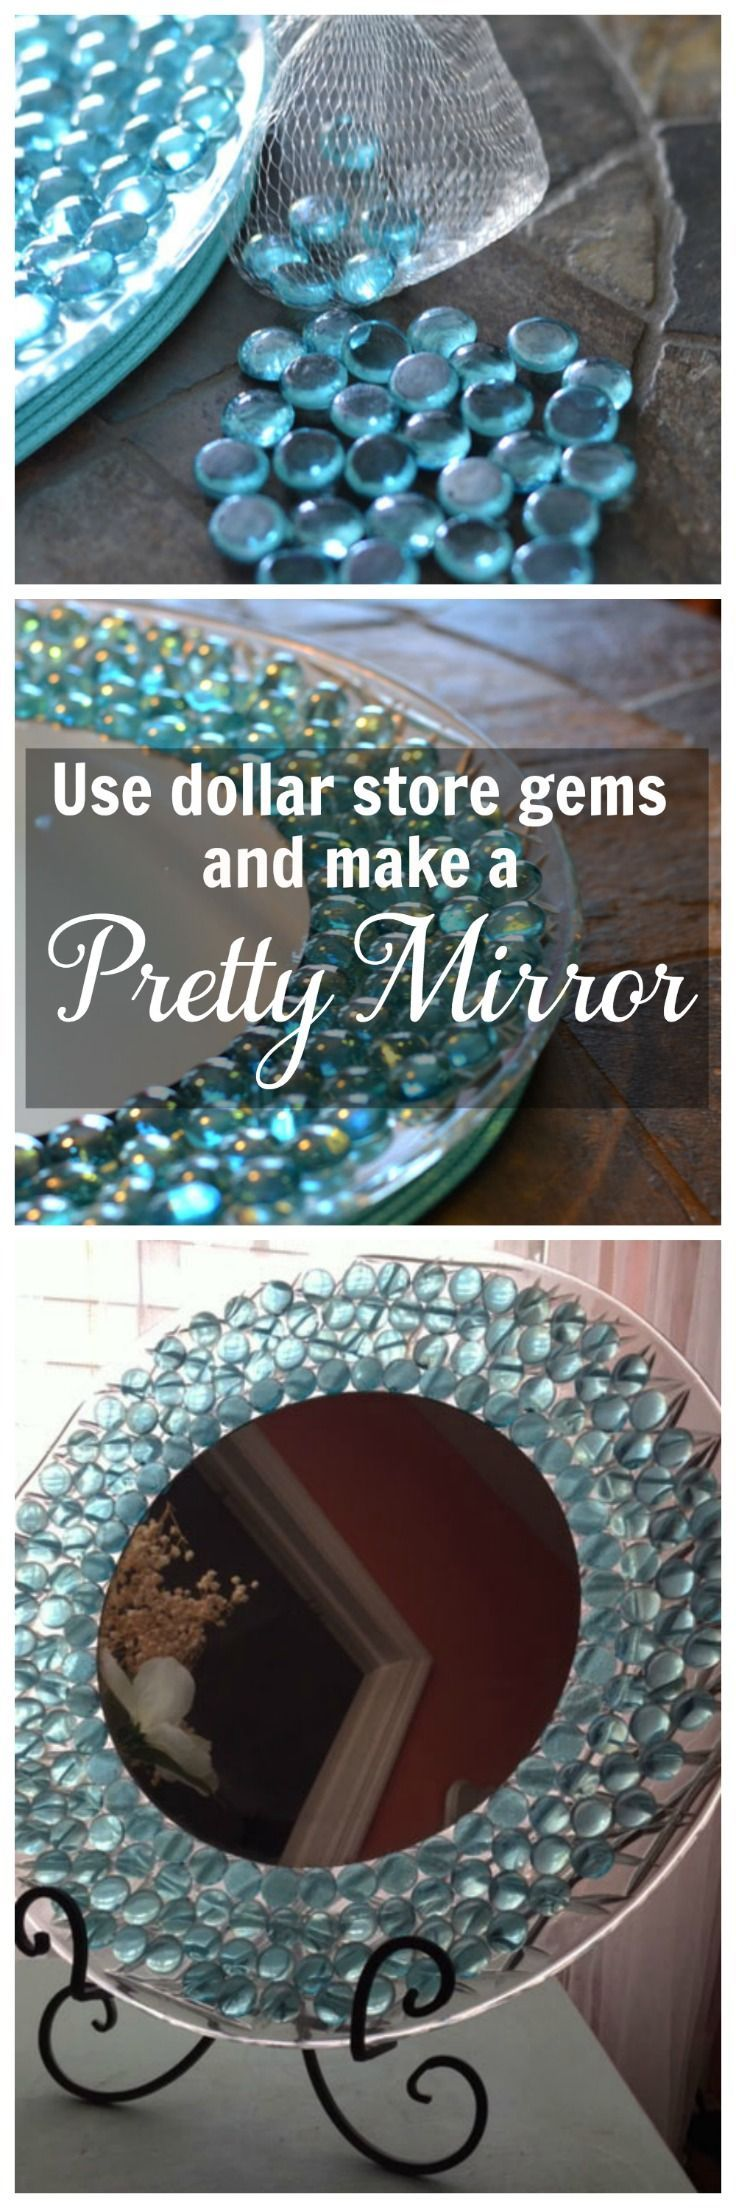 Use dollar store gems to make a pretty mirror